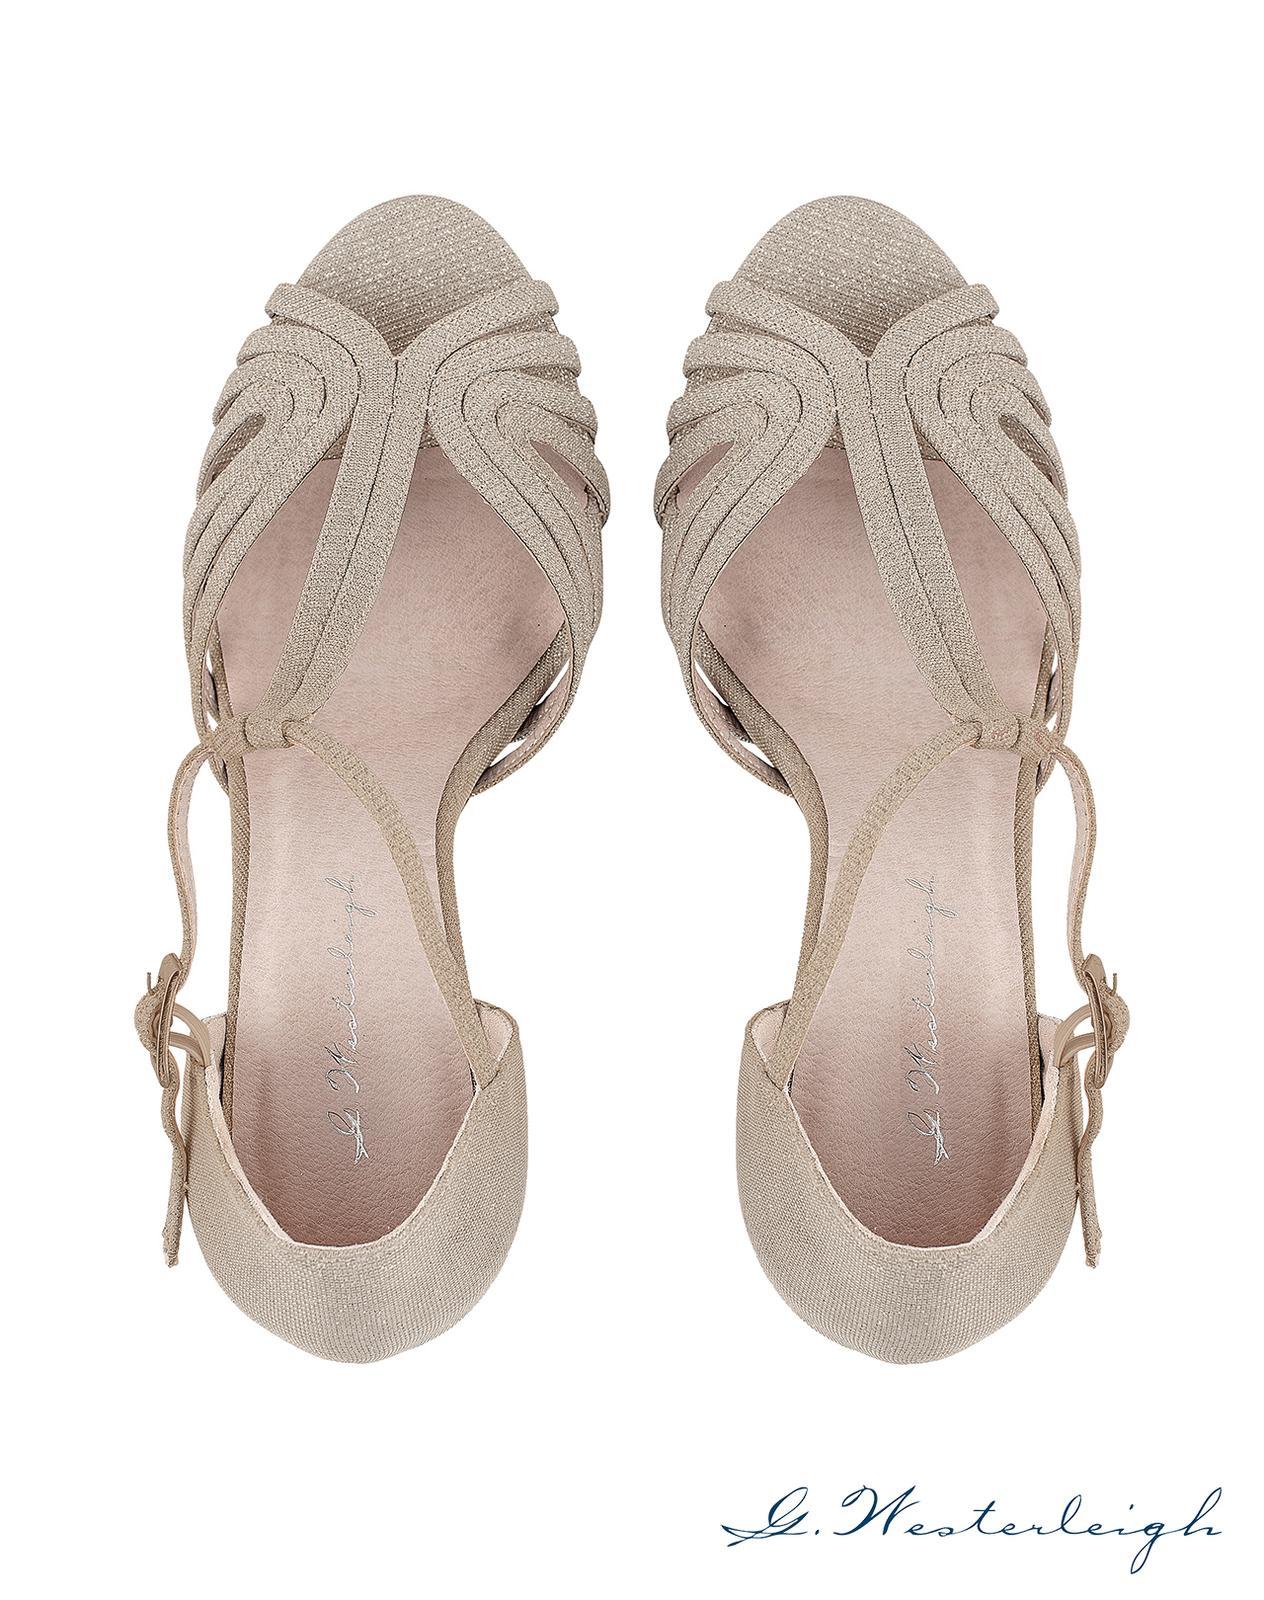 Spoločenské topánky Marbella - Obrázok č. 3